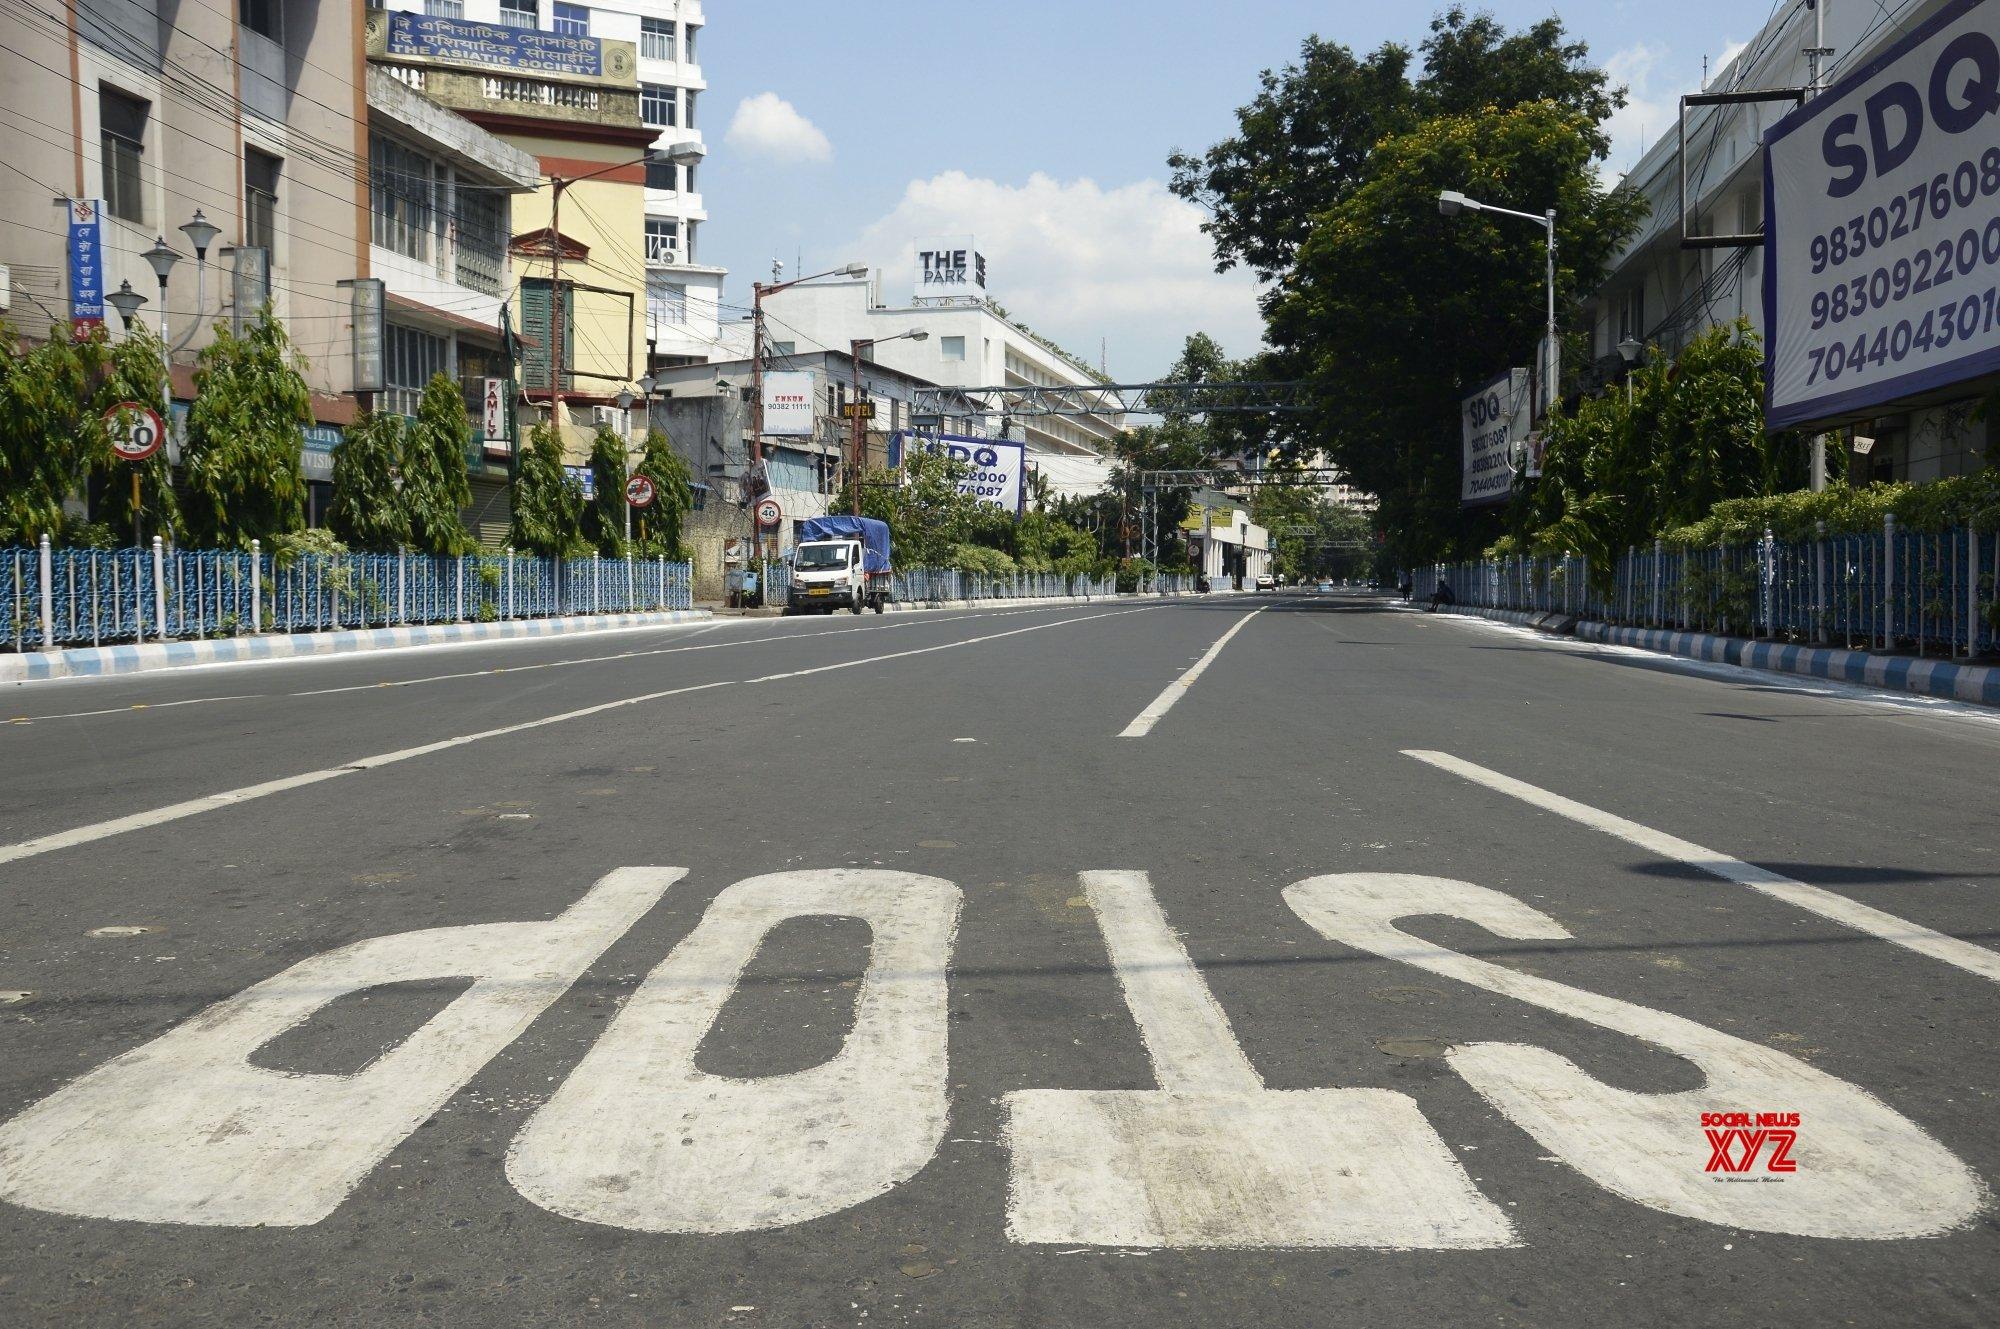 Kolkata: Roads are deserted looks at evening during lockdown on Coronavirus pandemic - in Kolkata. #Gallery